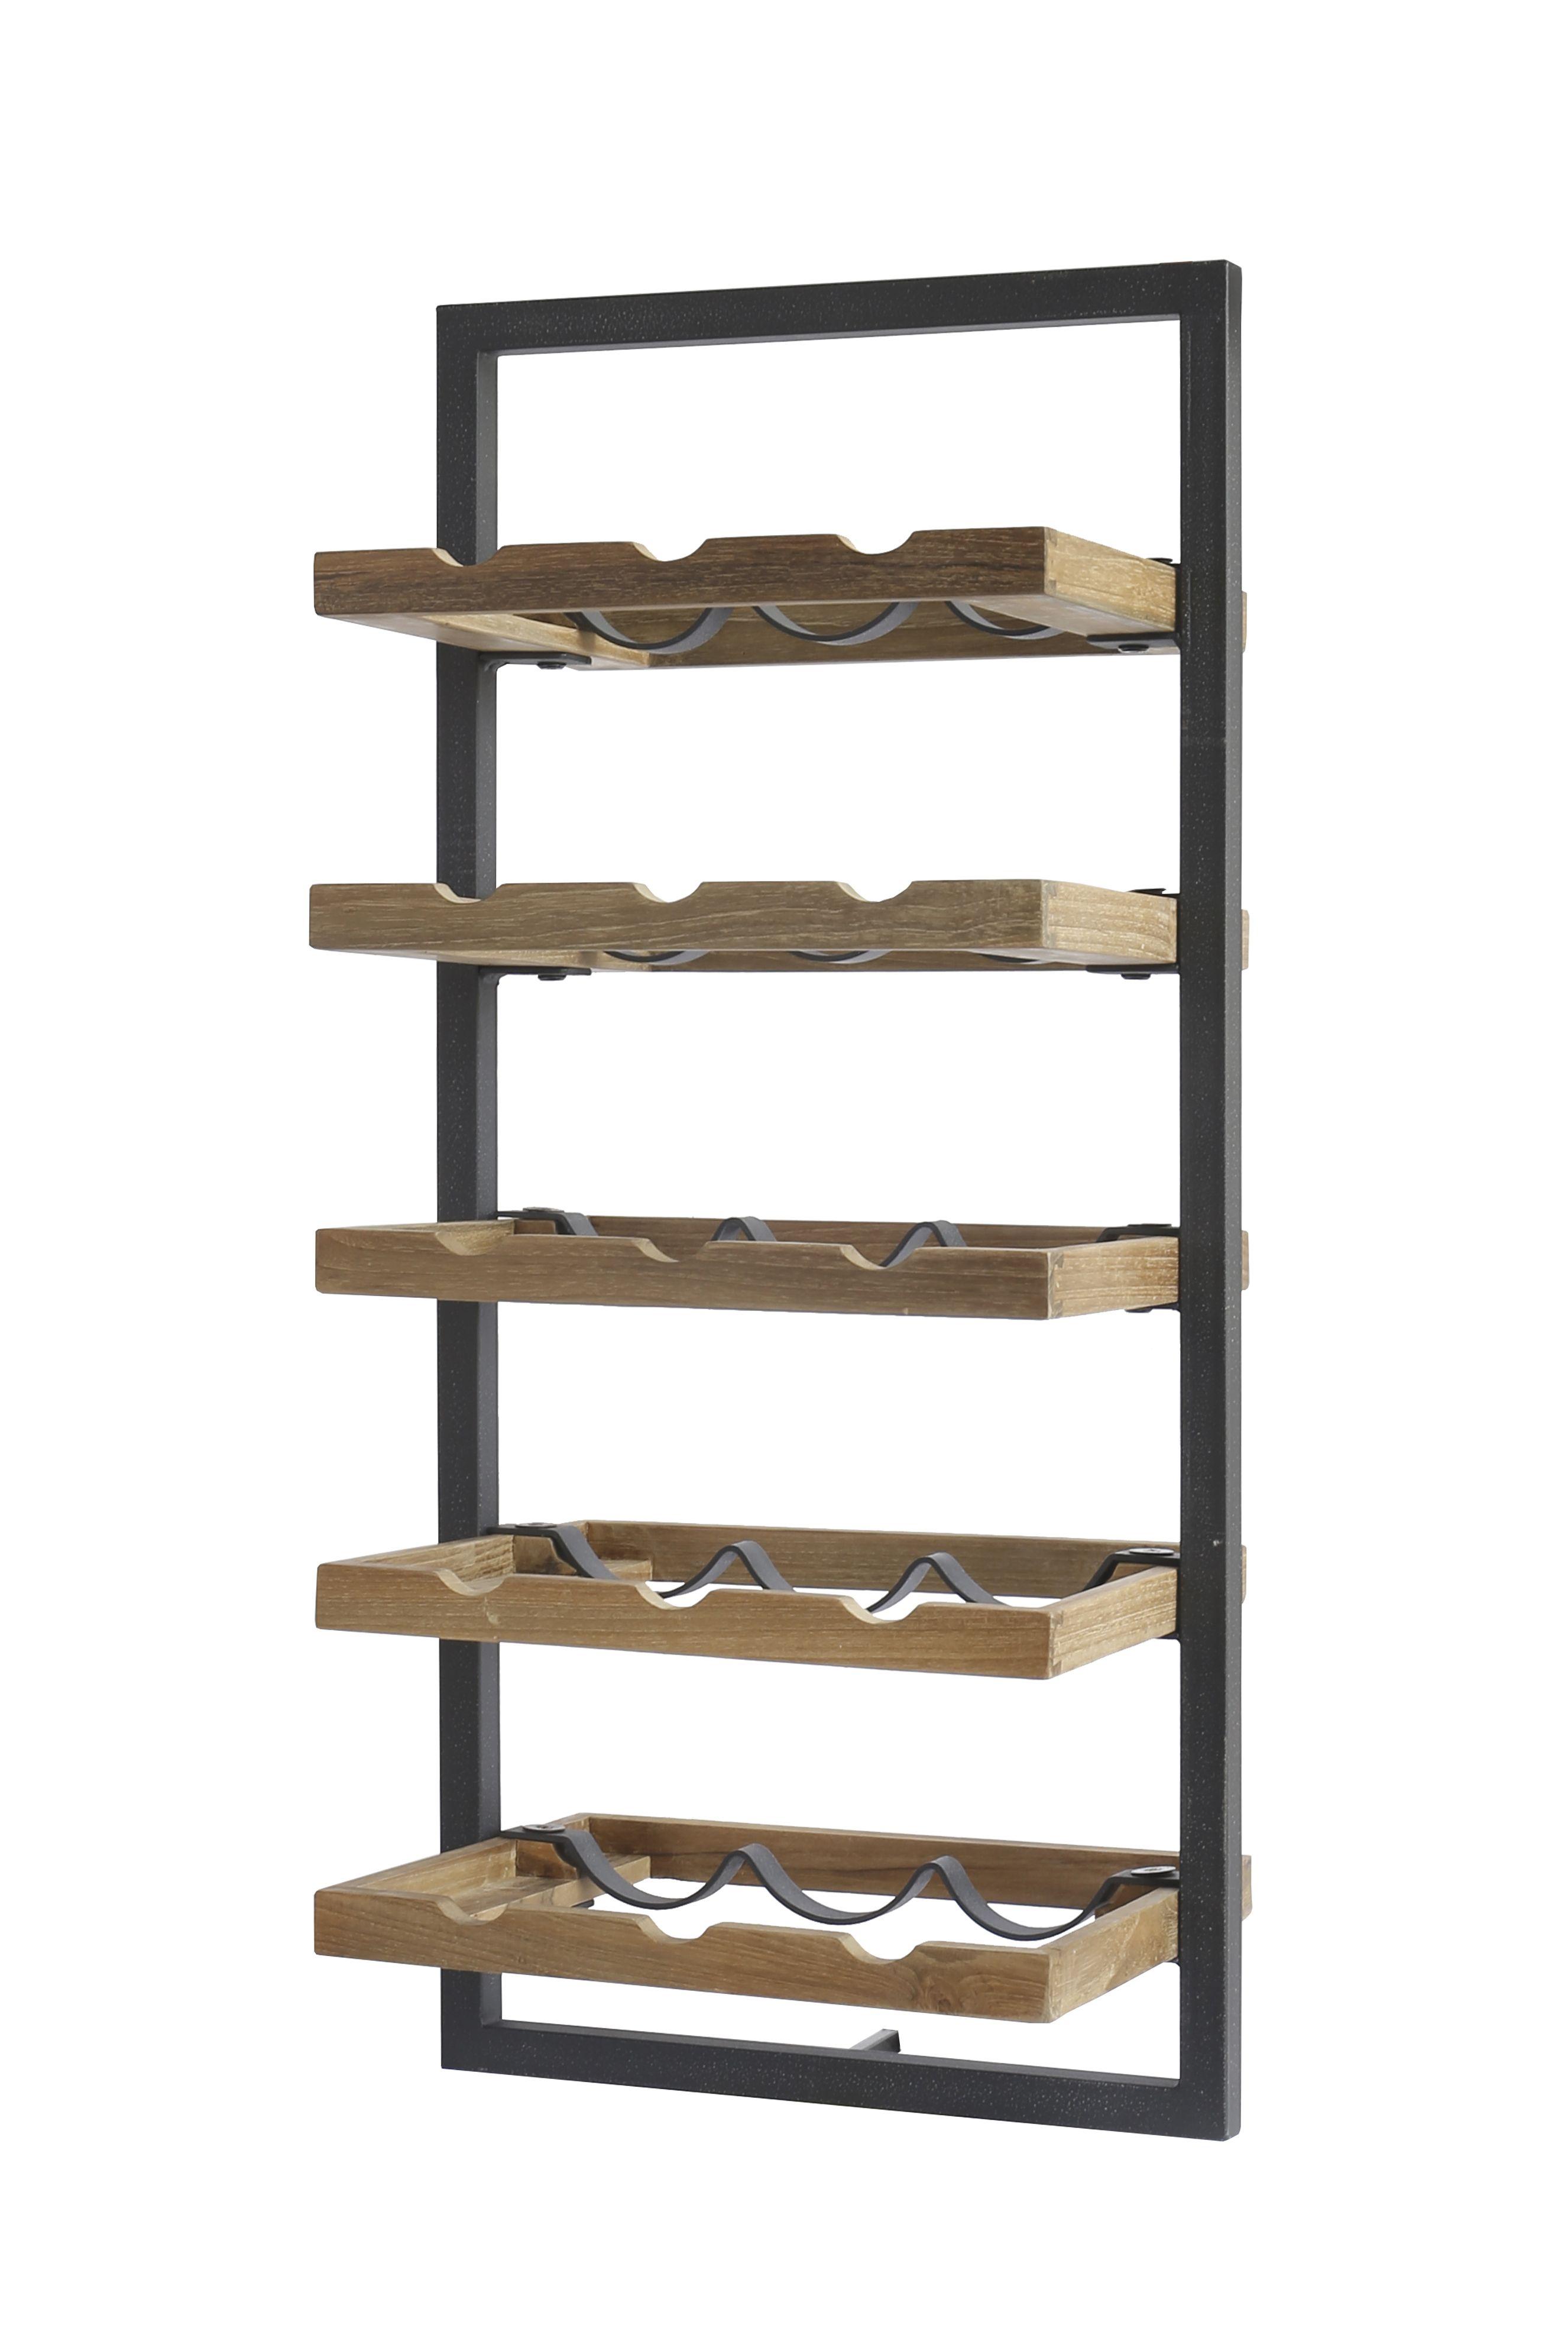 Shelfmate Winerack Type E By D Bodhi Wine Shelves Storage Teak